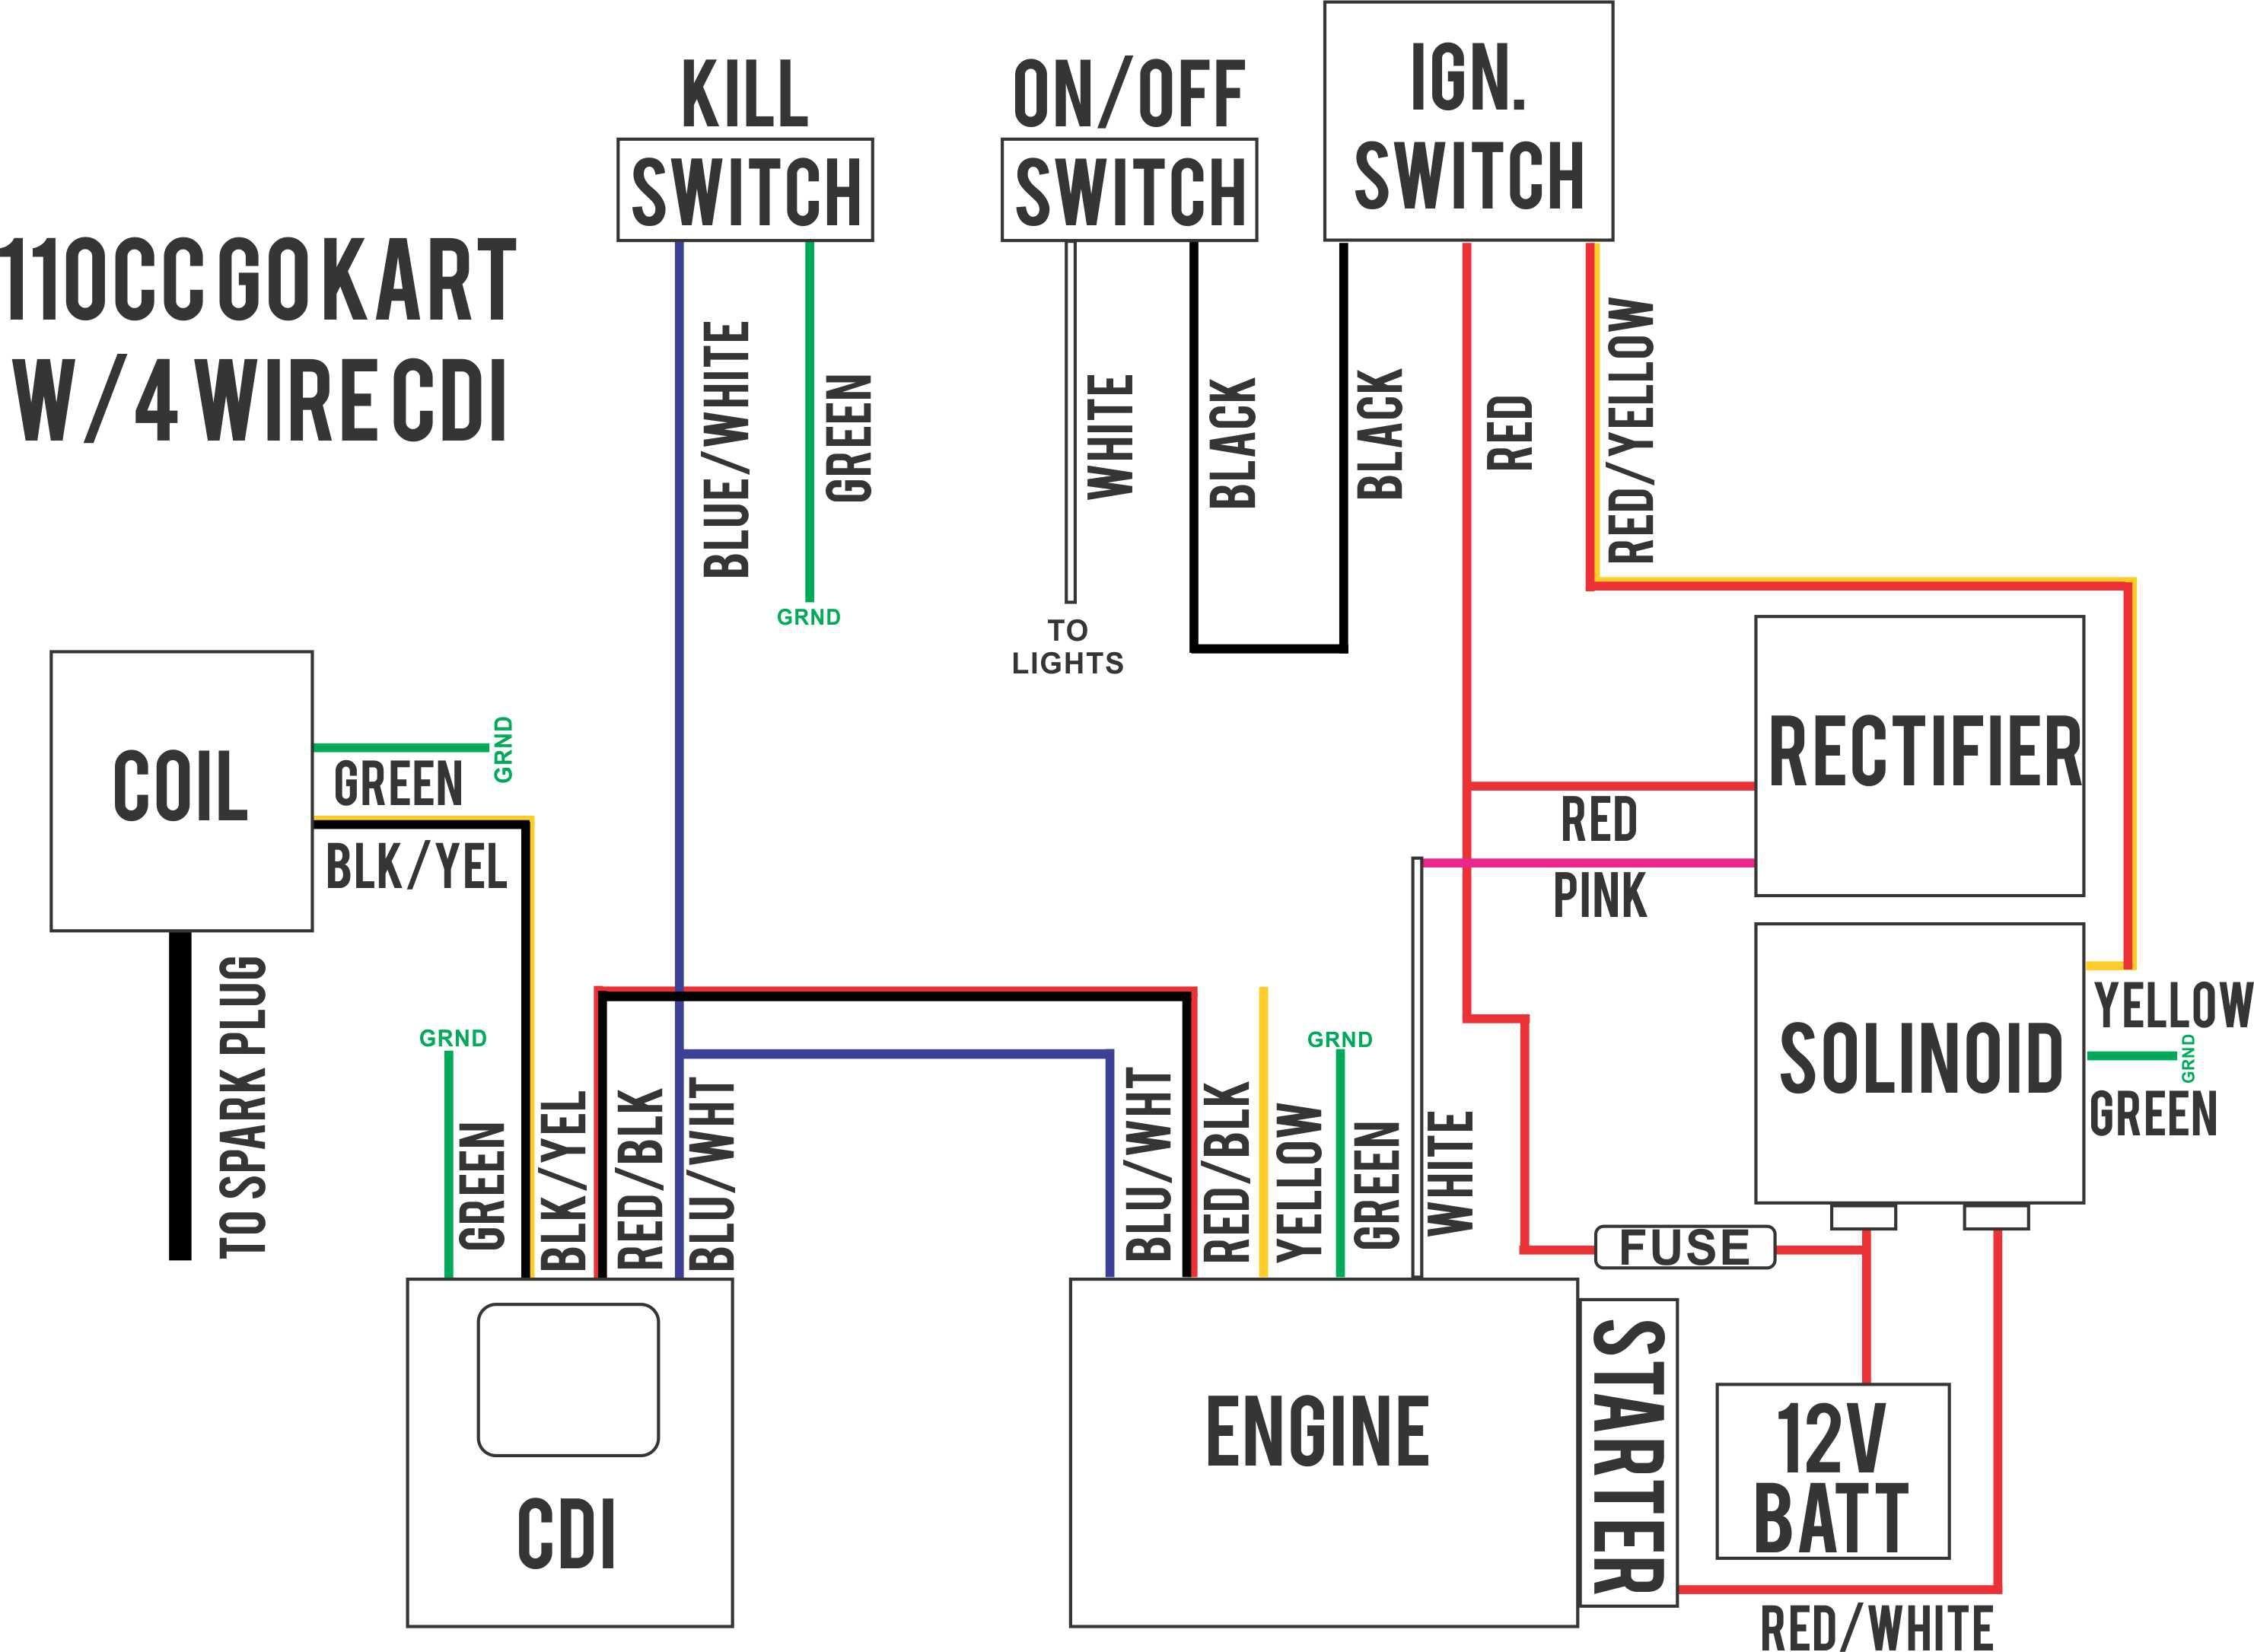 Basic Ignition Wiring Diagram Fresh Harley Davidson Ignition Switch Wiring Diagram Diagram Of Basic Ignition Wiring Diagram